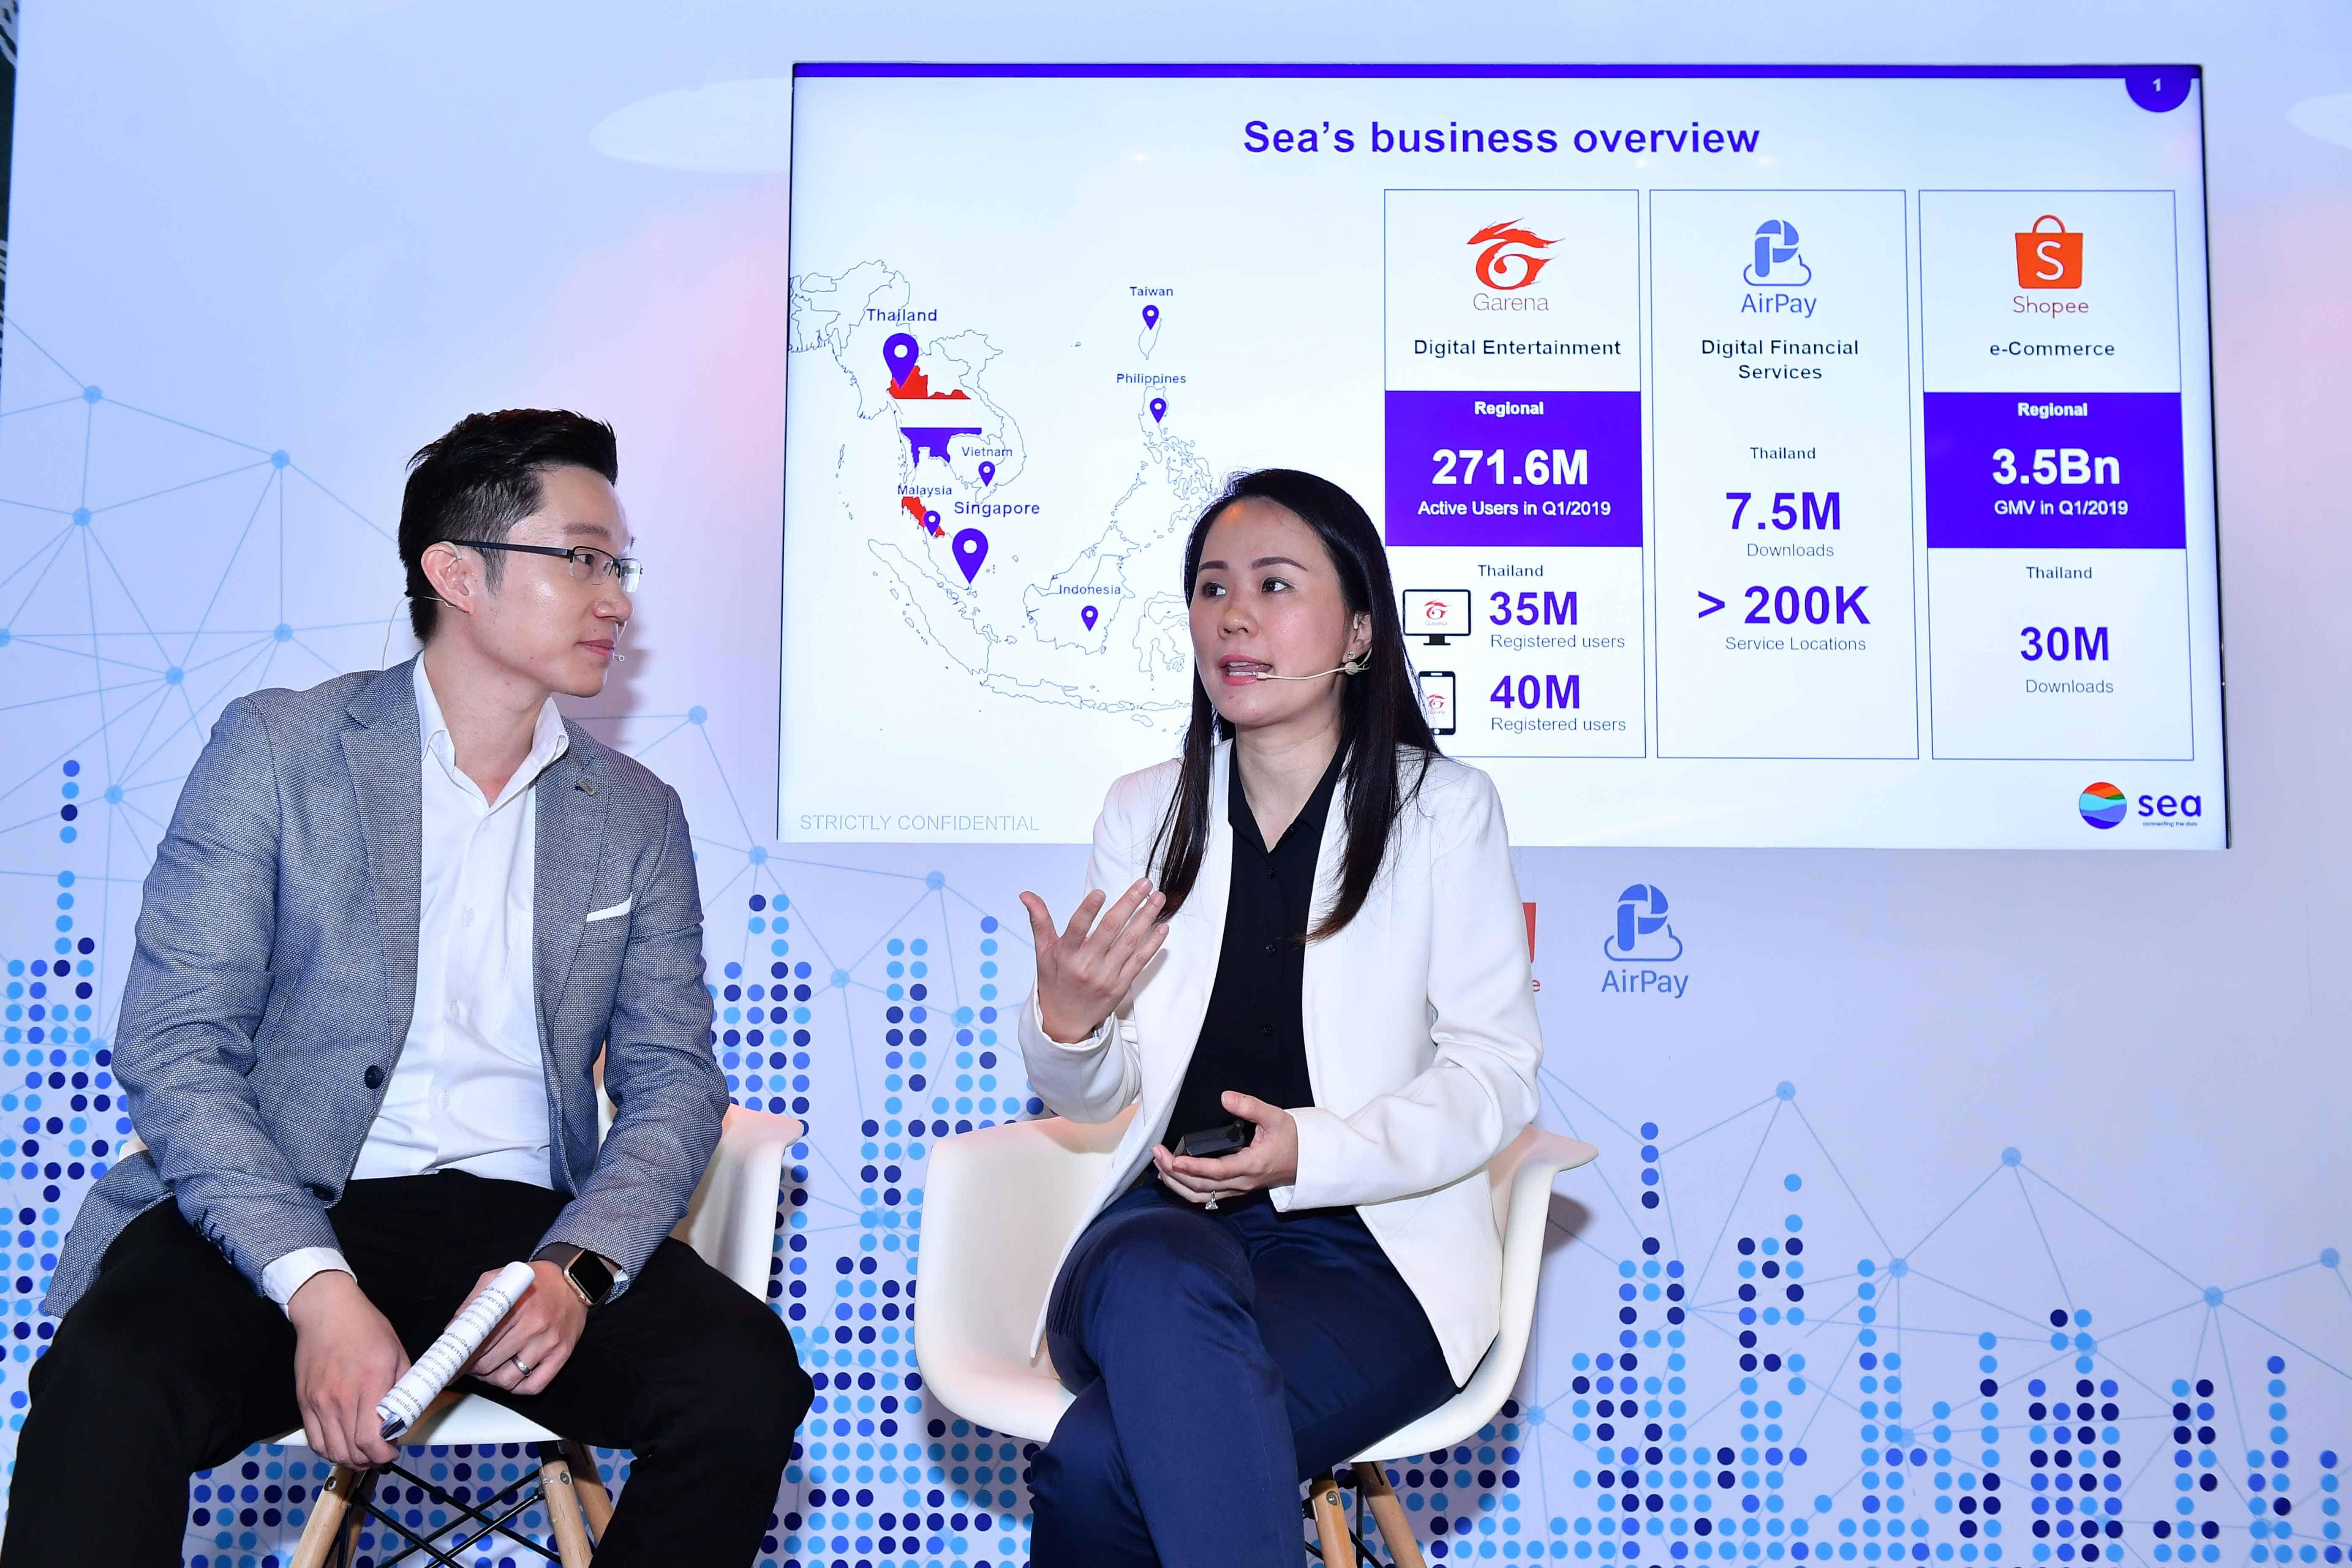 [PR] Sea (ประเทศไทย) ตอกย้ำพันธกิจ 'Connecting the dots' พร้อมยกระดับเศรษฐกิจดิจิทัล